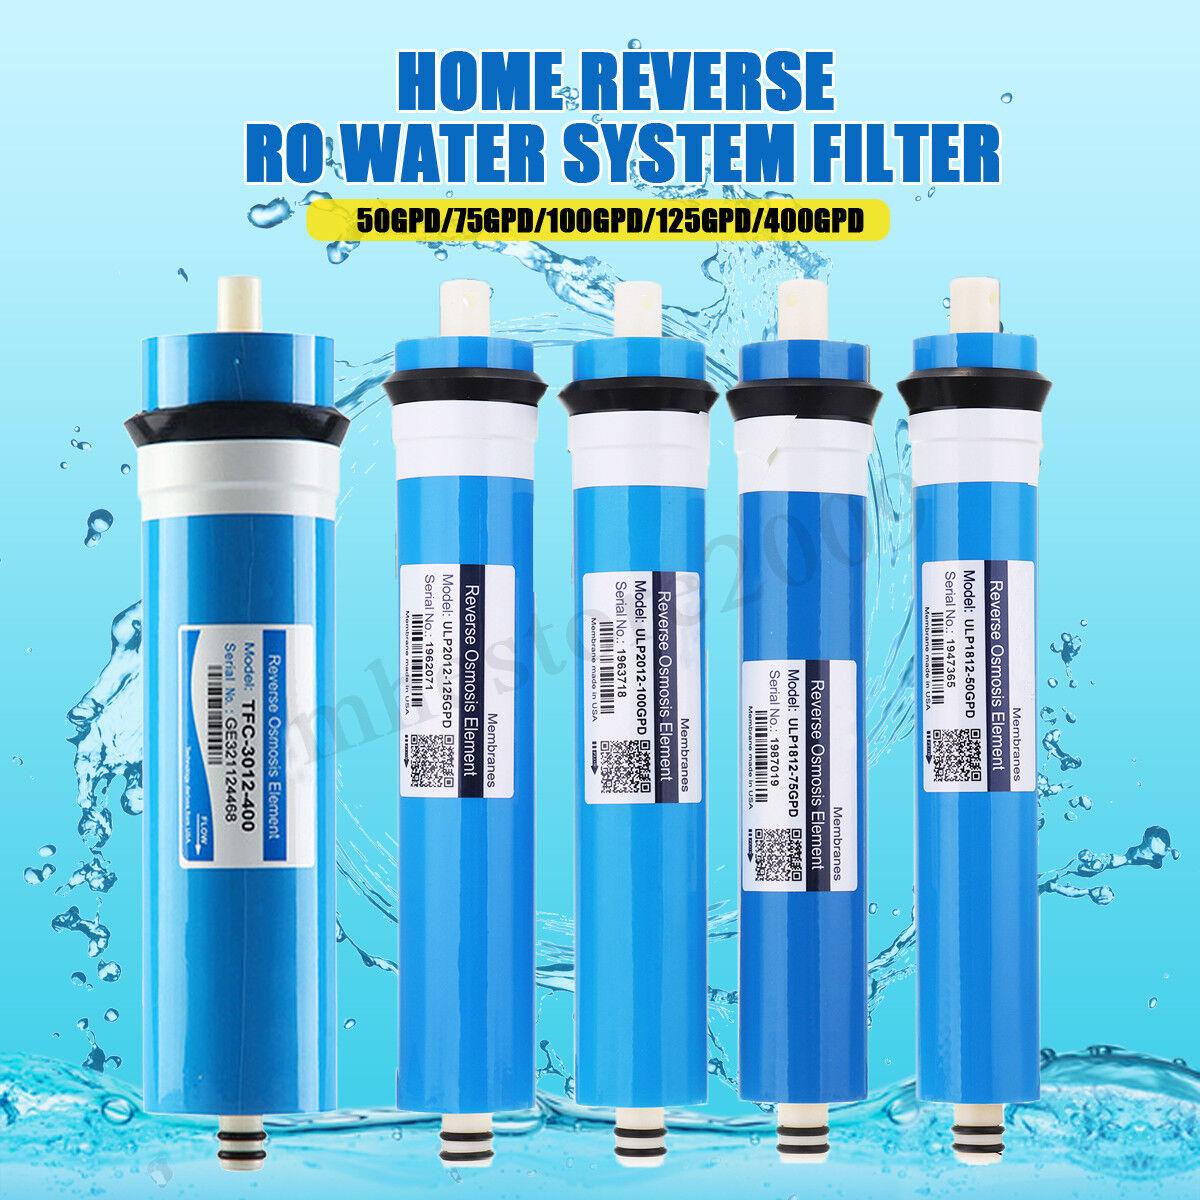 TAOEE Reverse Osmosis 3012-400G Membrane Water Filter Cartridges Replacement 400 GPD RO Membrane Water Filter System